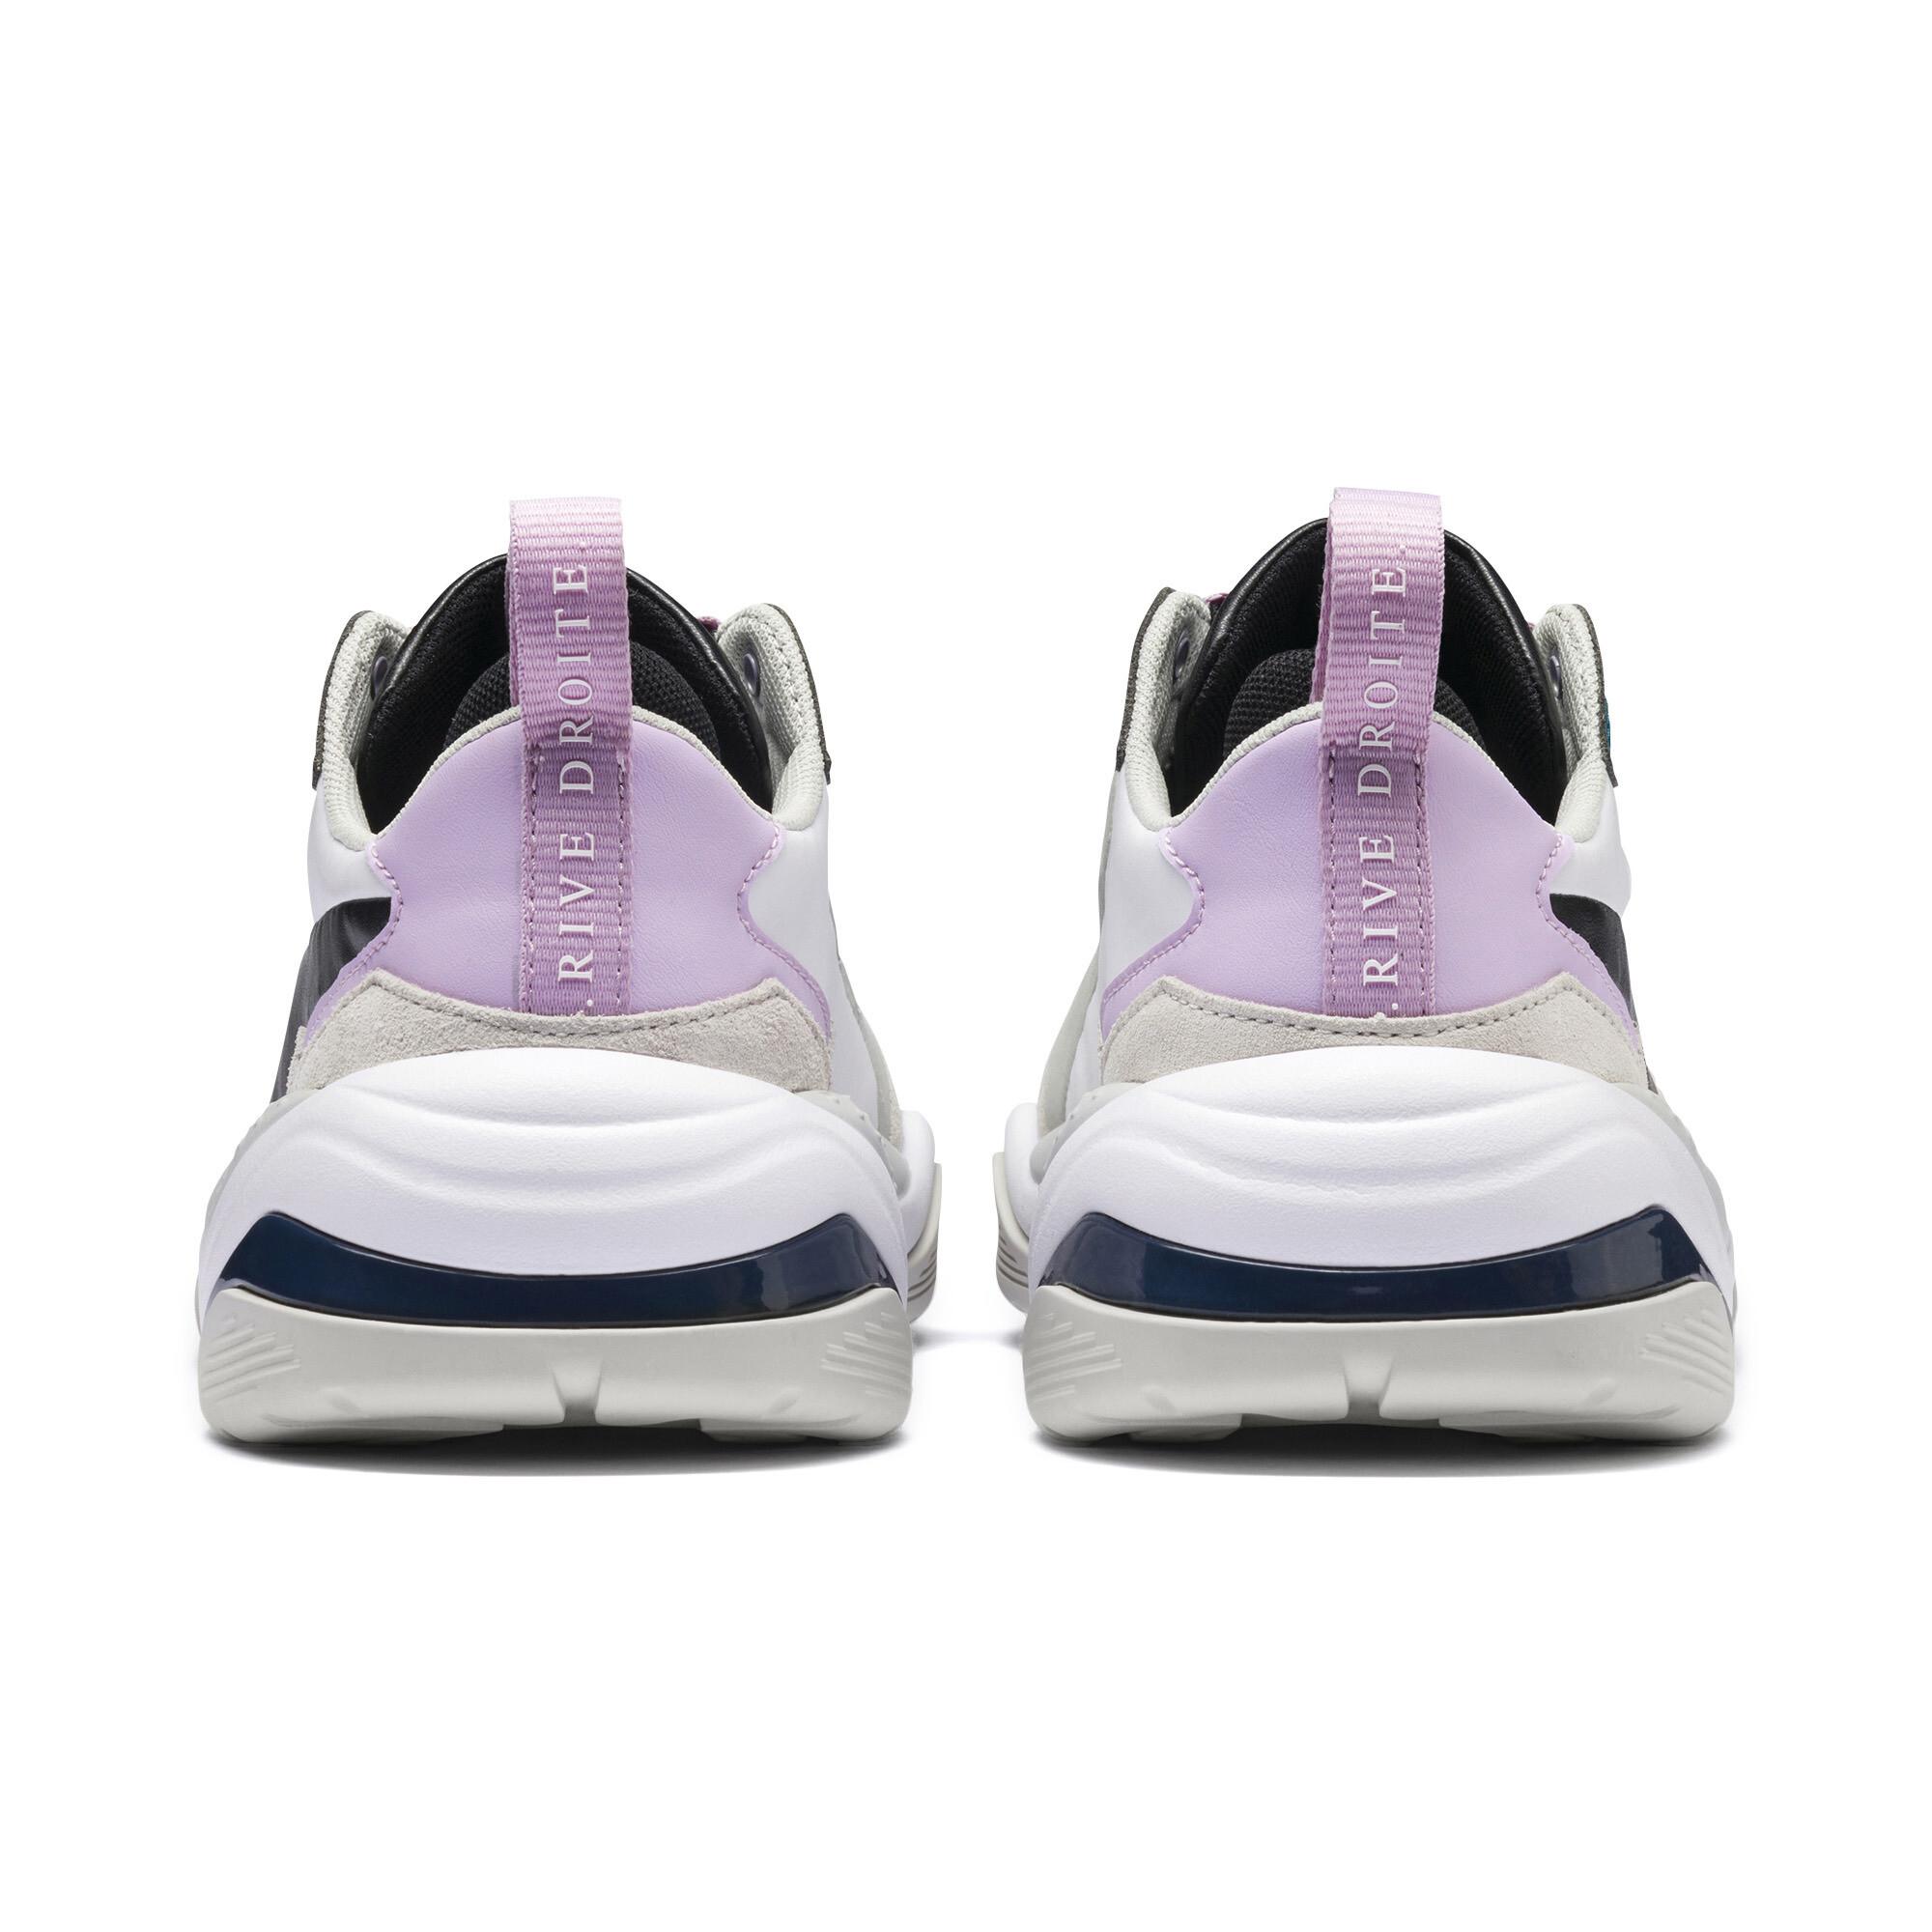 Image Puma Thunder Rive Droite Women's Sneakers #4